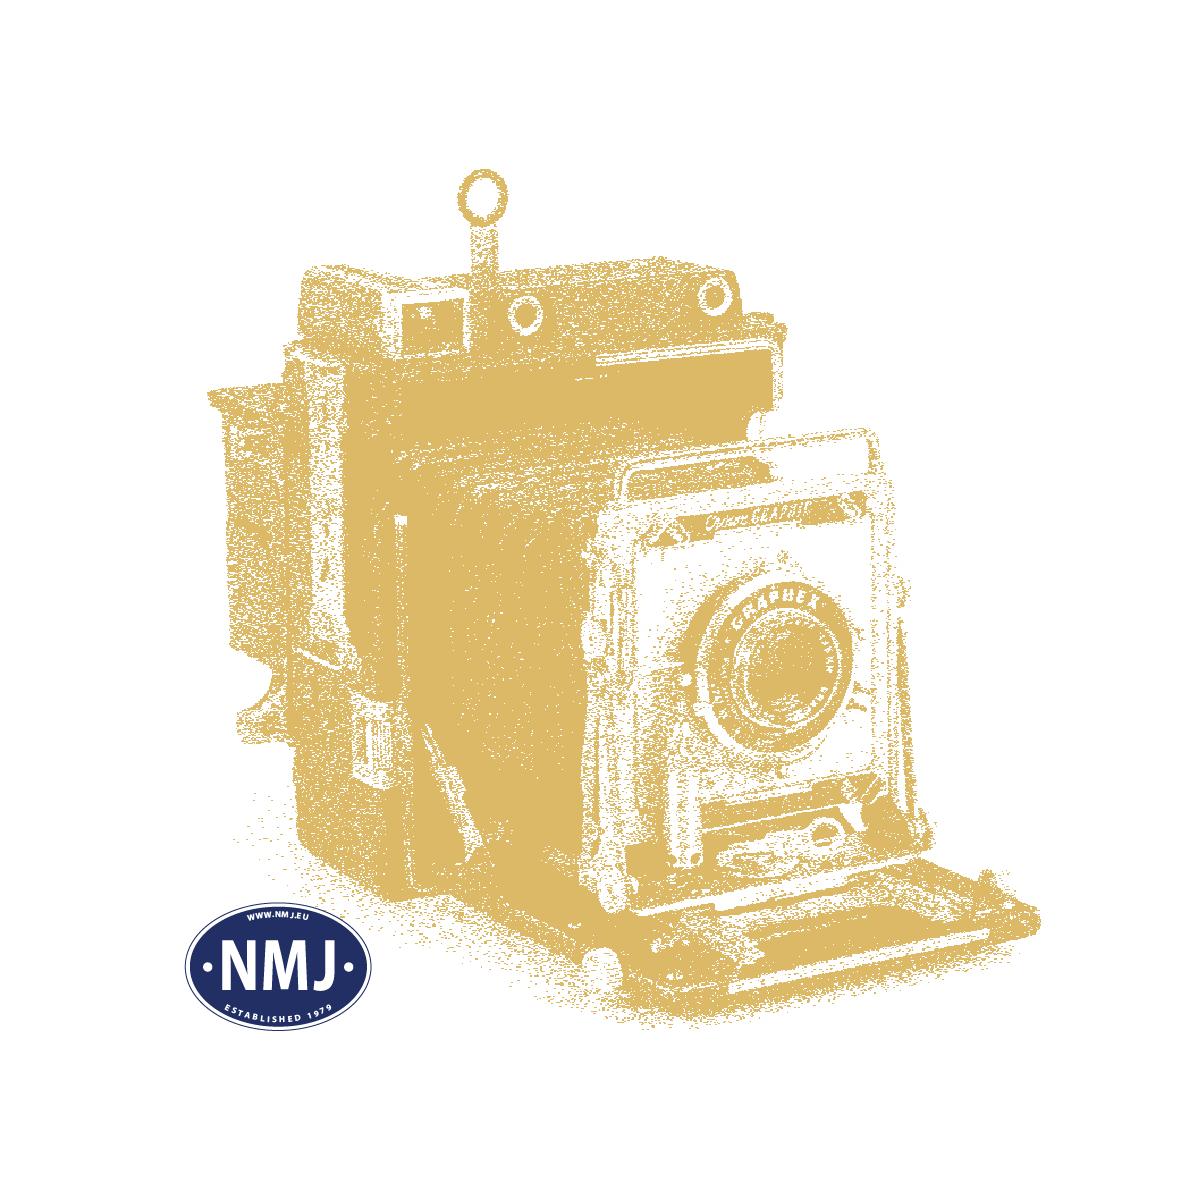 NMJT9933 - NSB Pantograf for El11